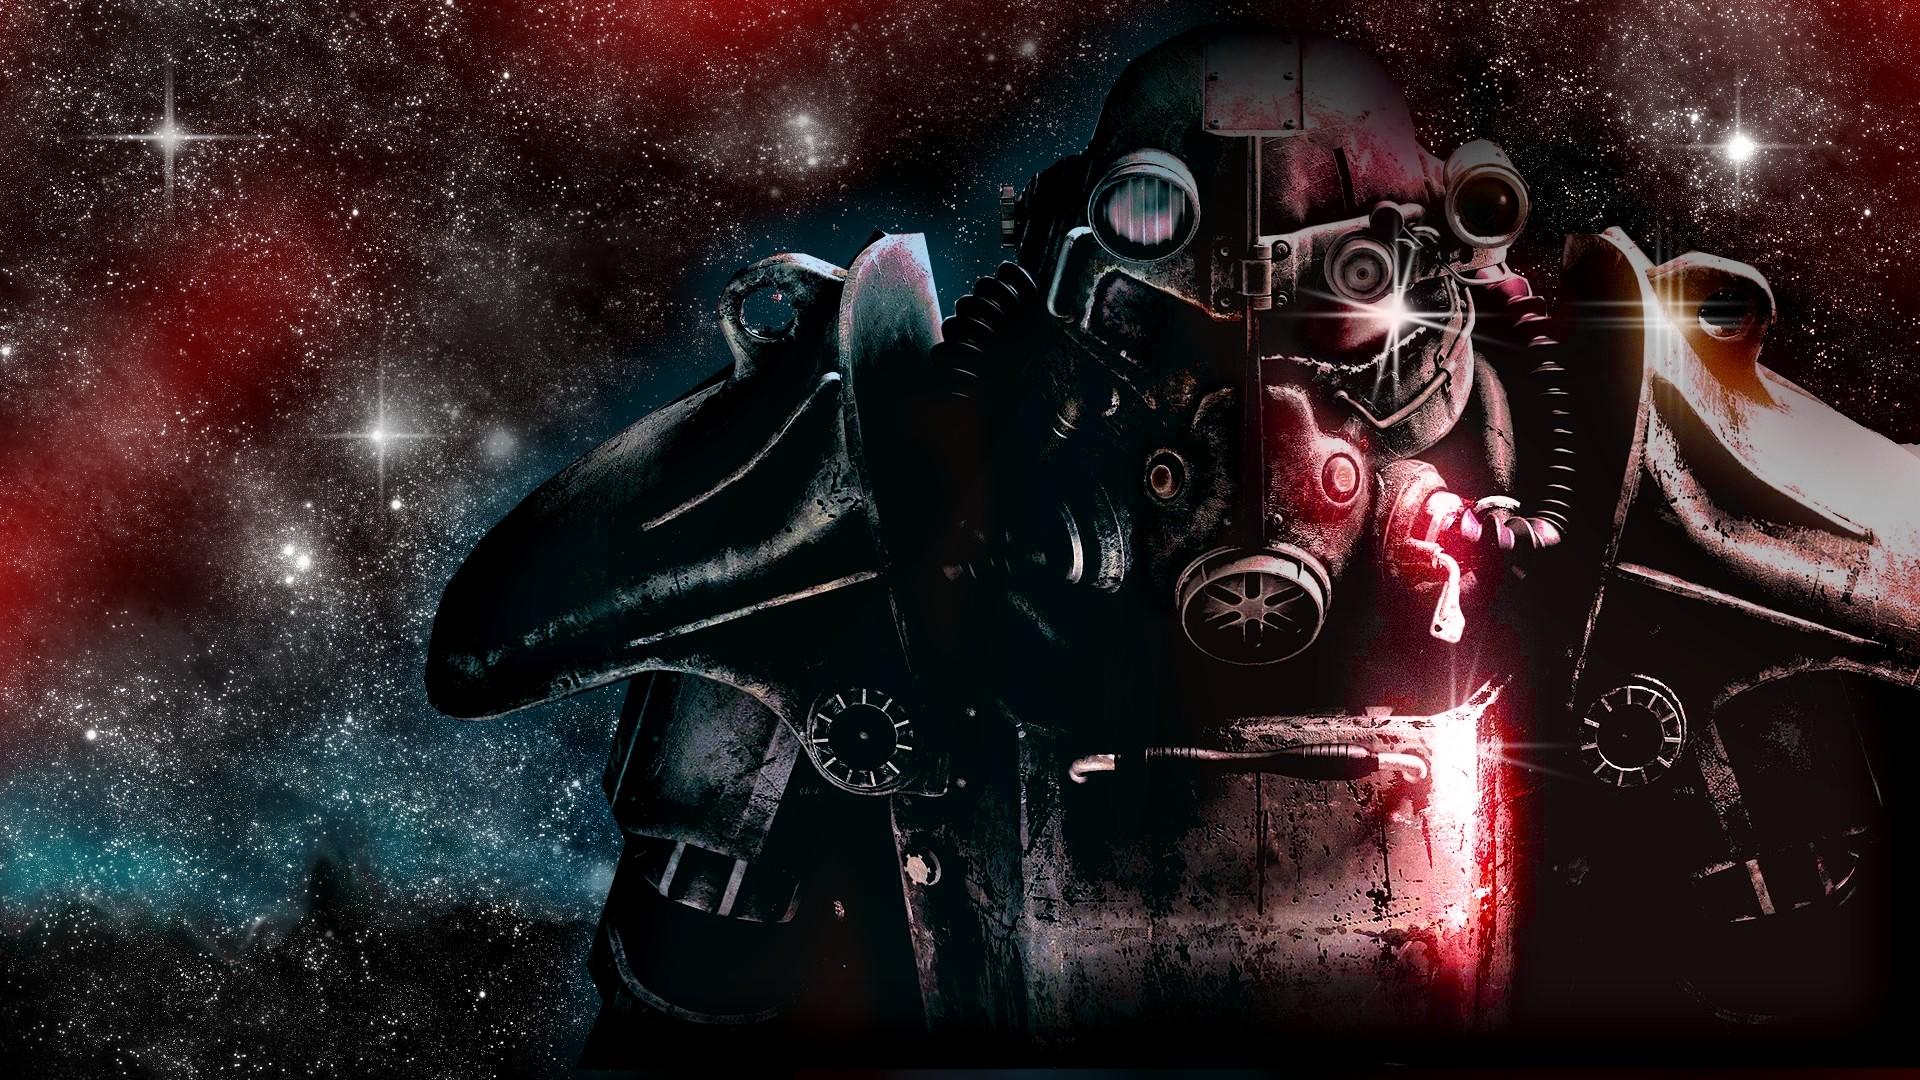 p.218, HD Fallout 4 Wallpaper, Fallout 4 Widescreen Pics